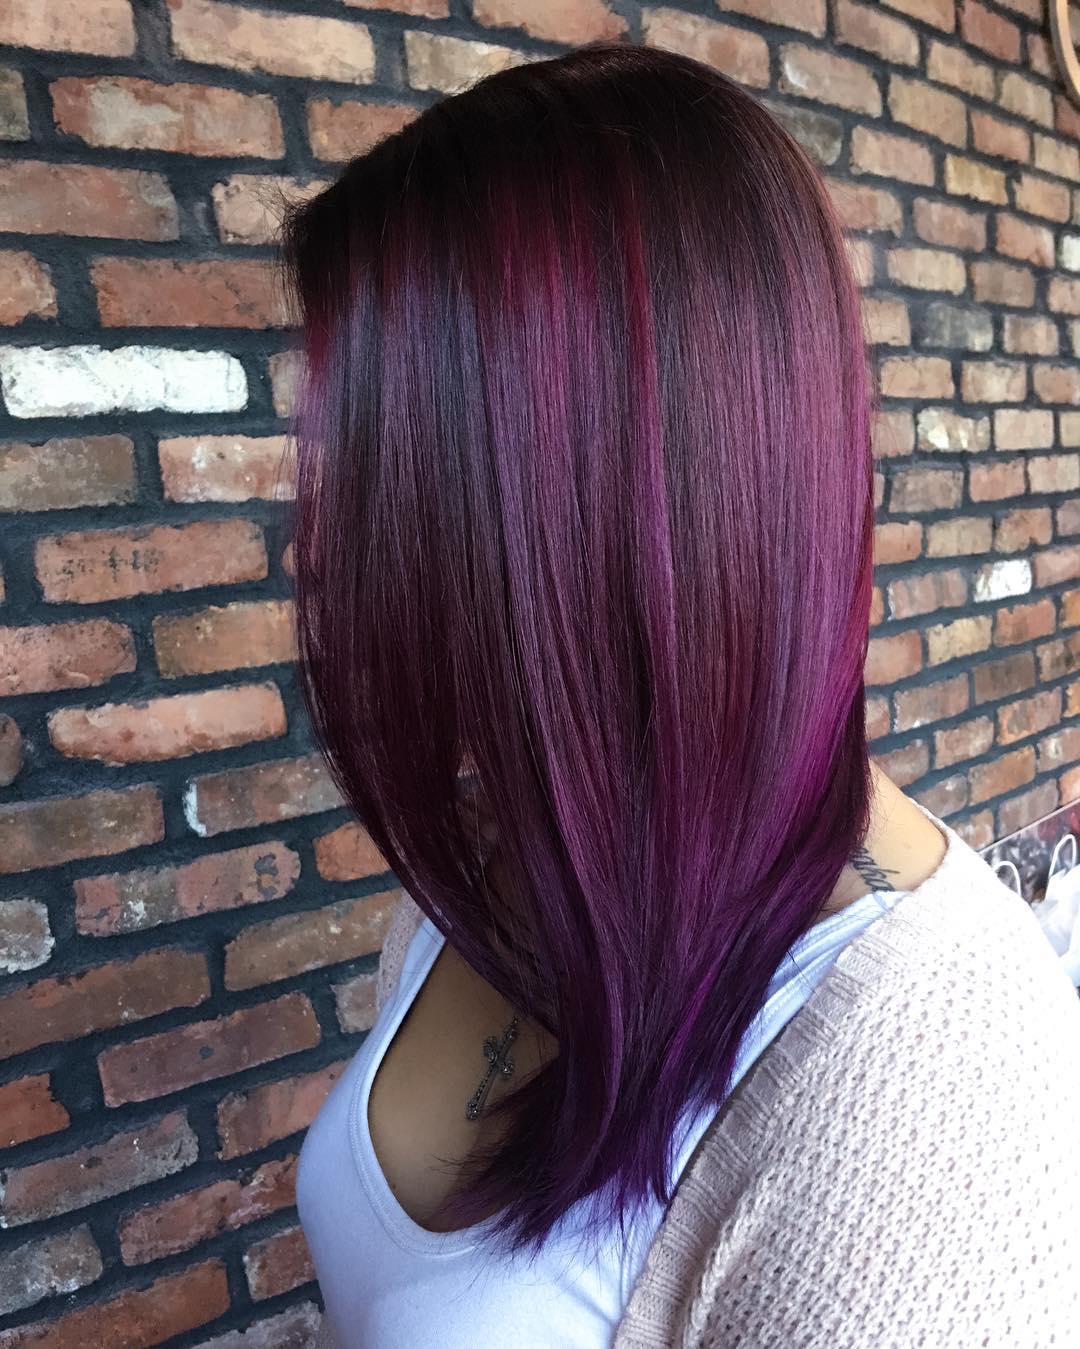 Dark brown hair with plum highlights